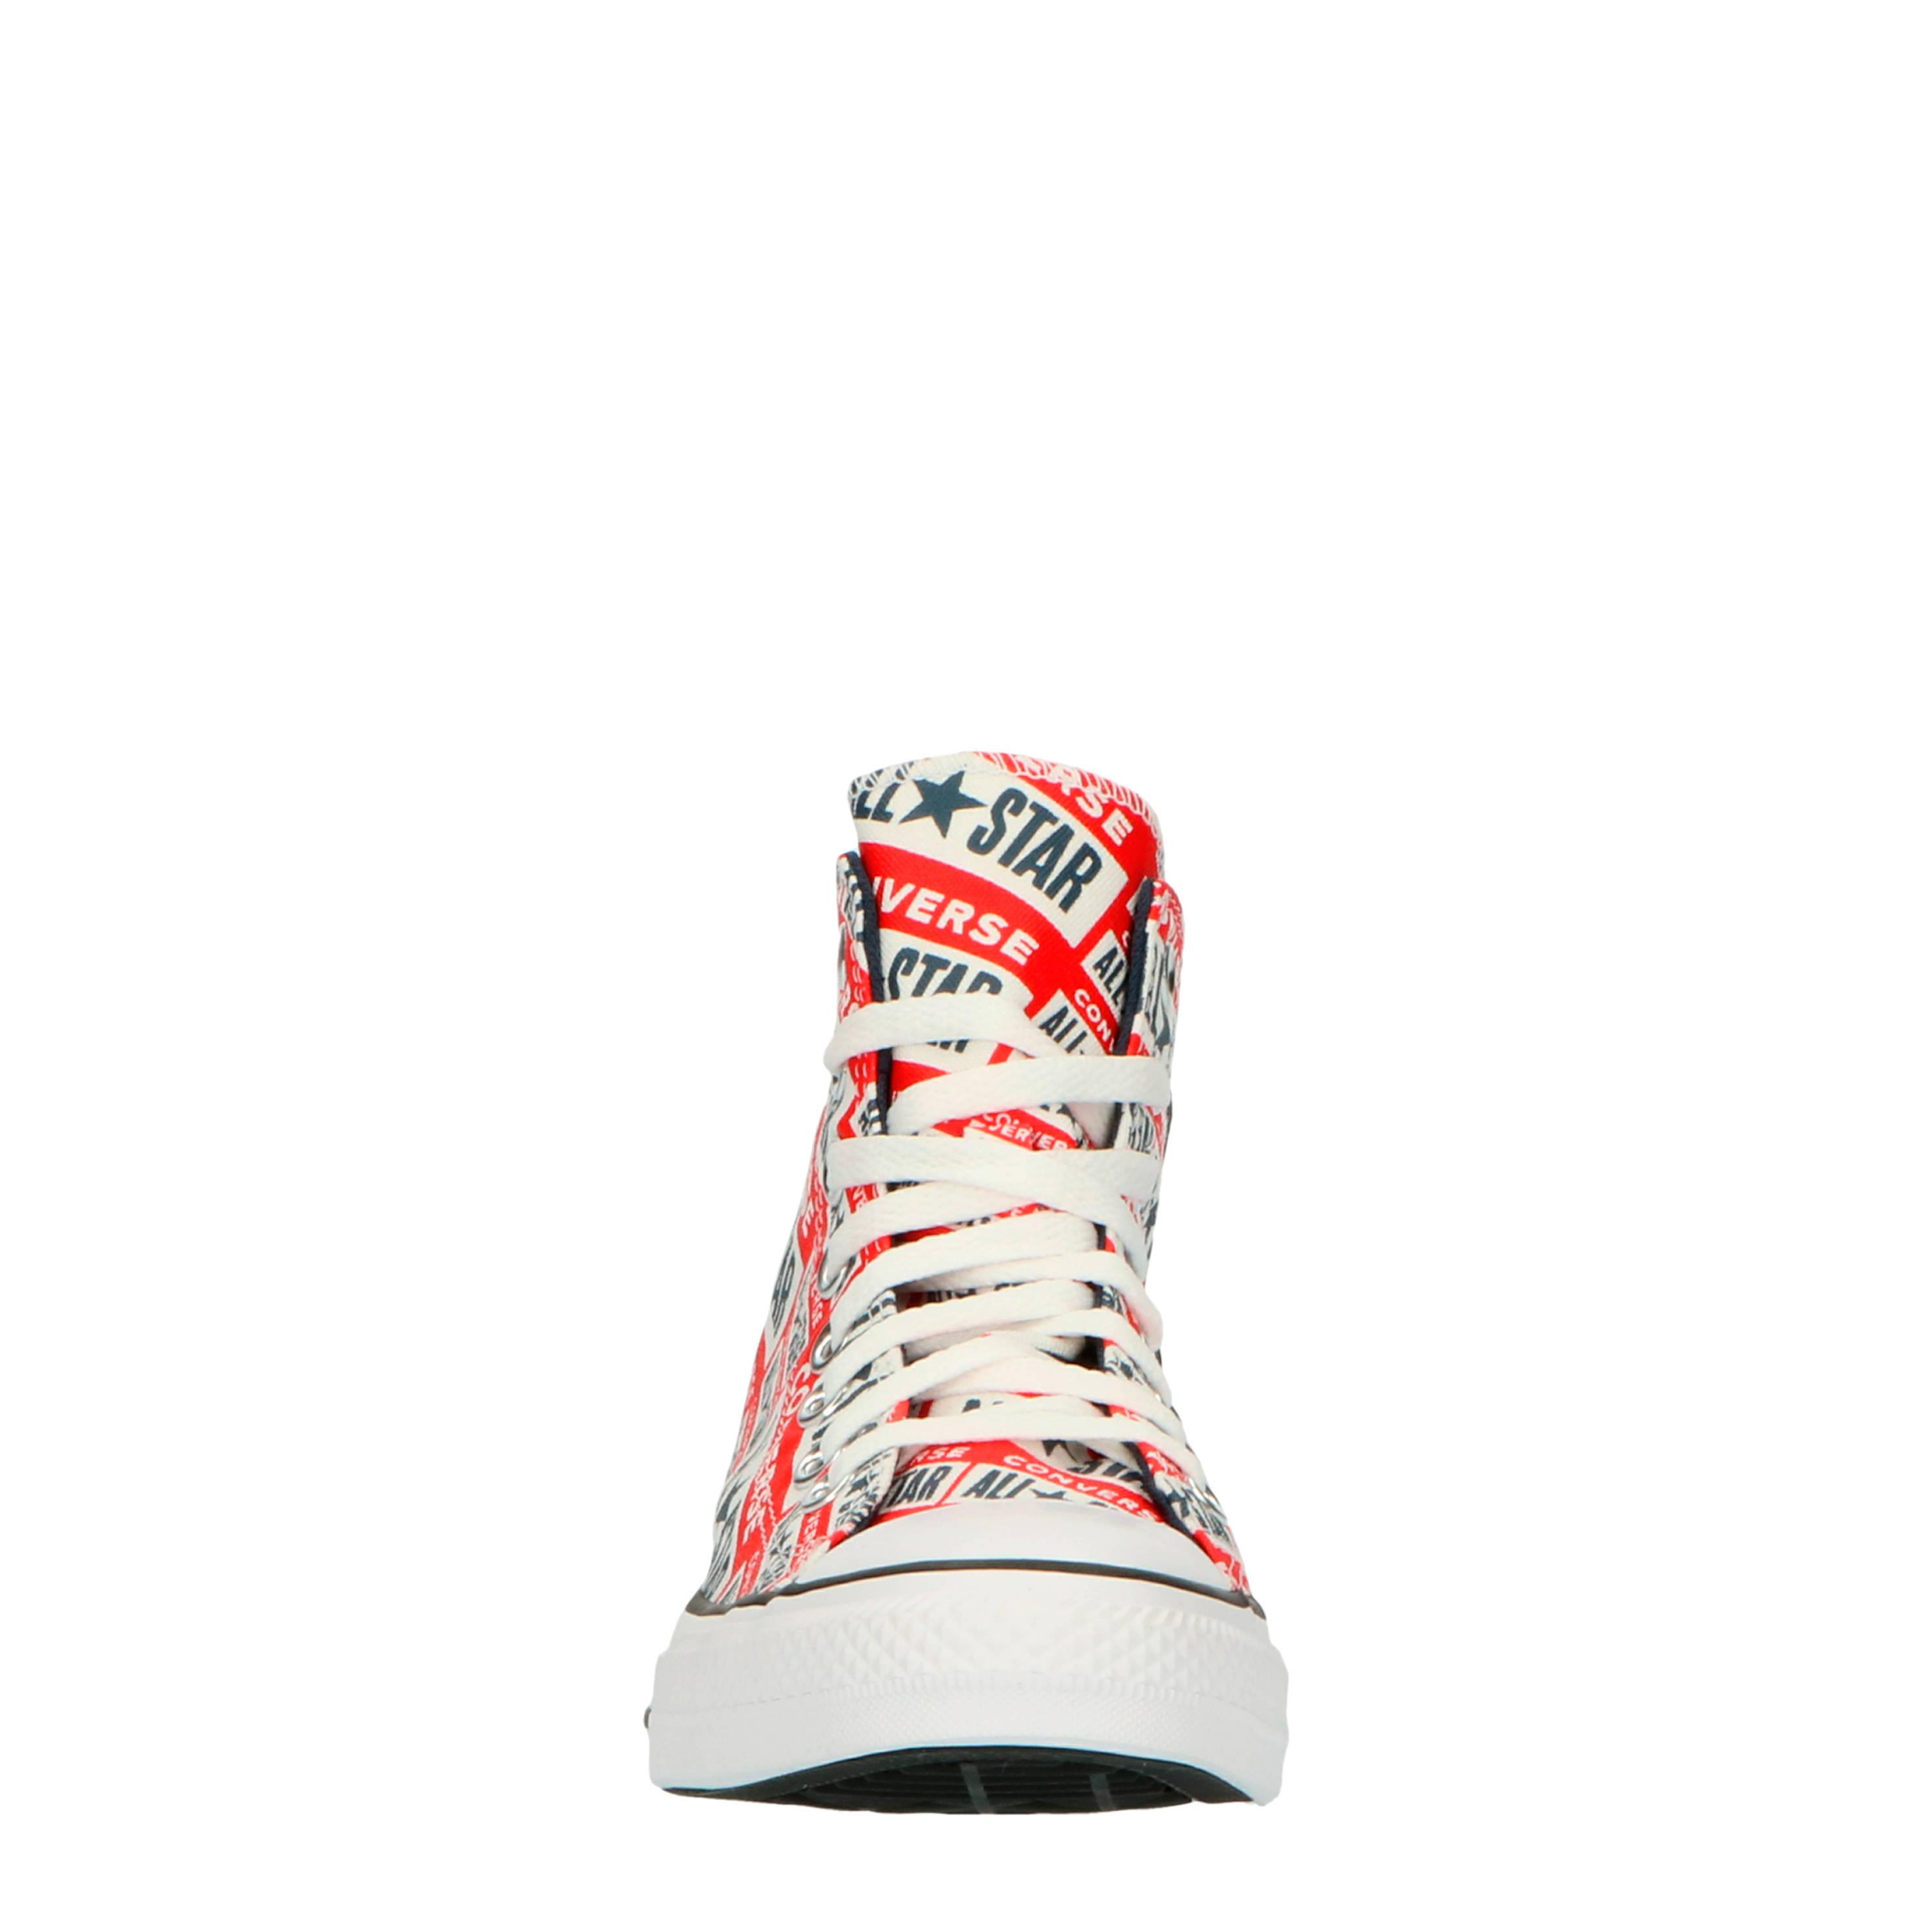 Converse Chuck Taylor All Star Hi sneakers met logoprint